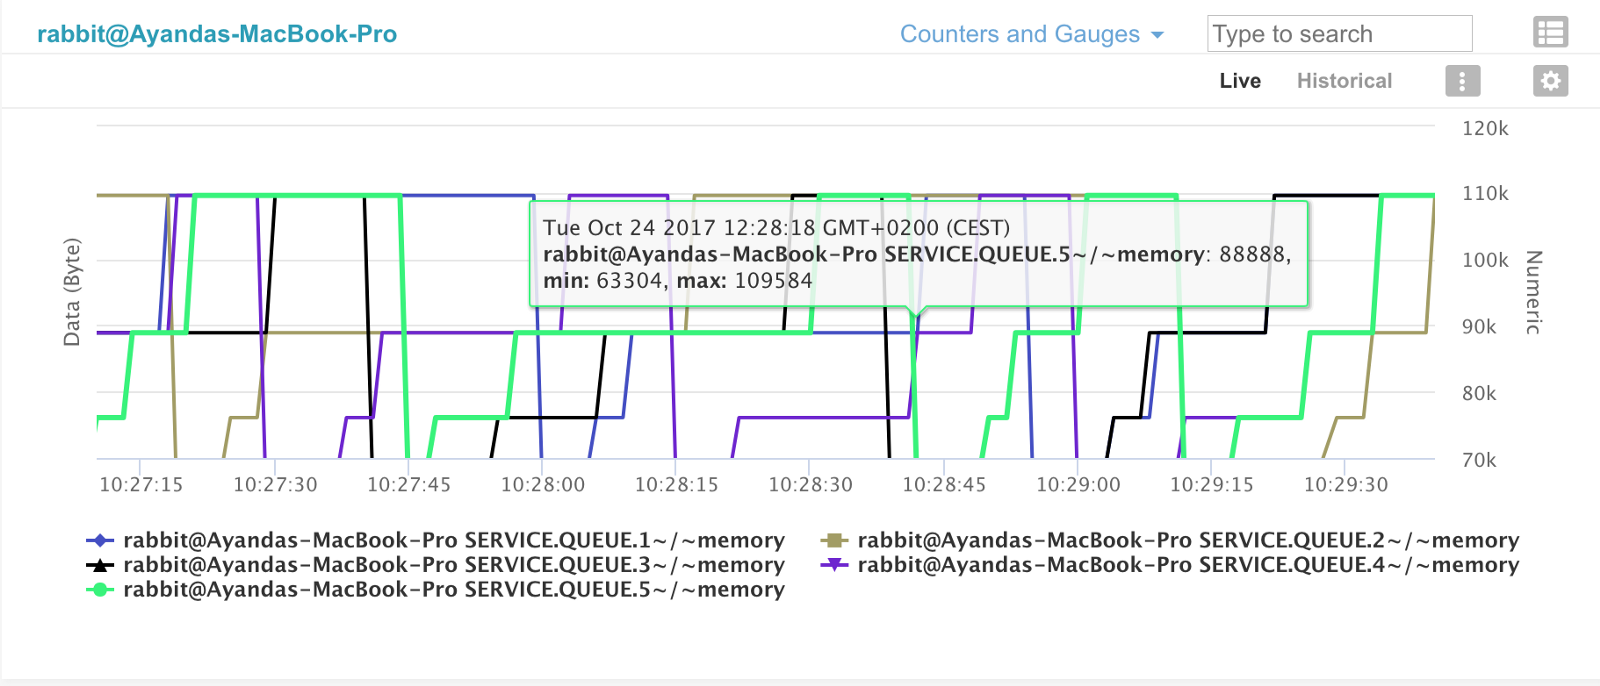 Advanced RabbitMQ Support Part II: Deeper Insight into